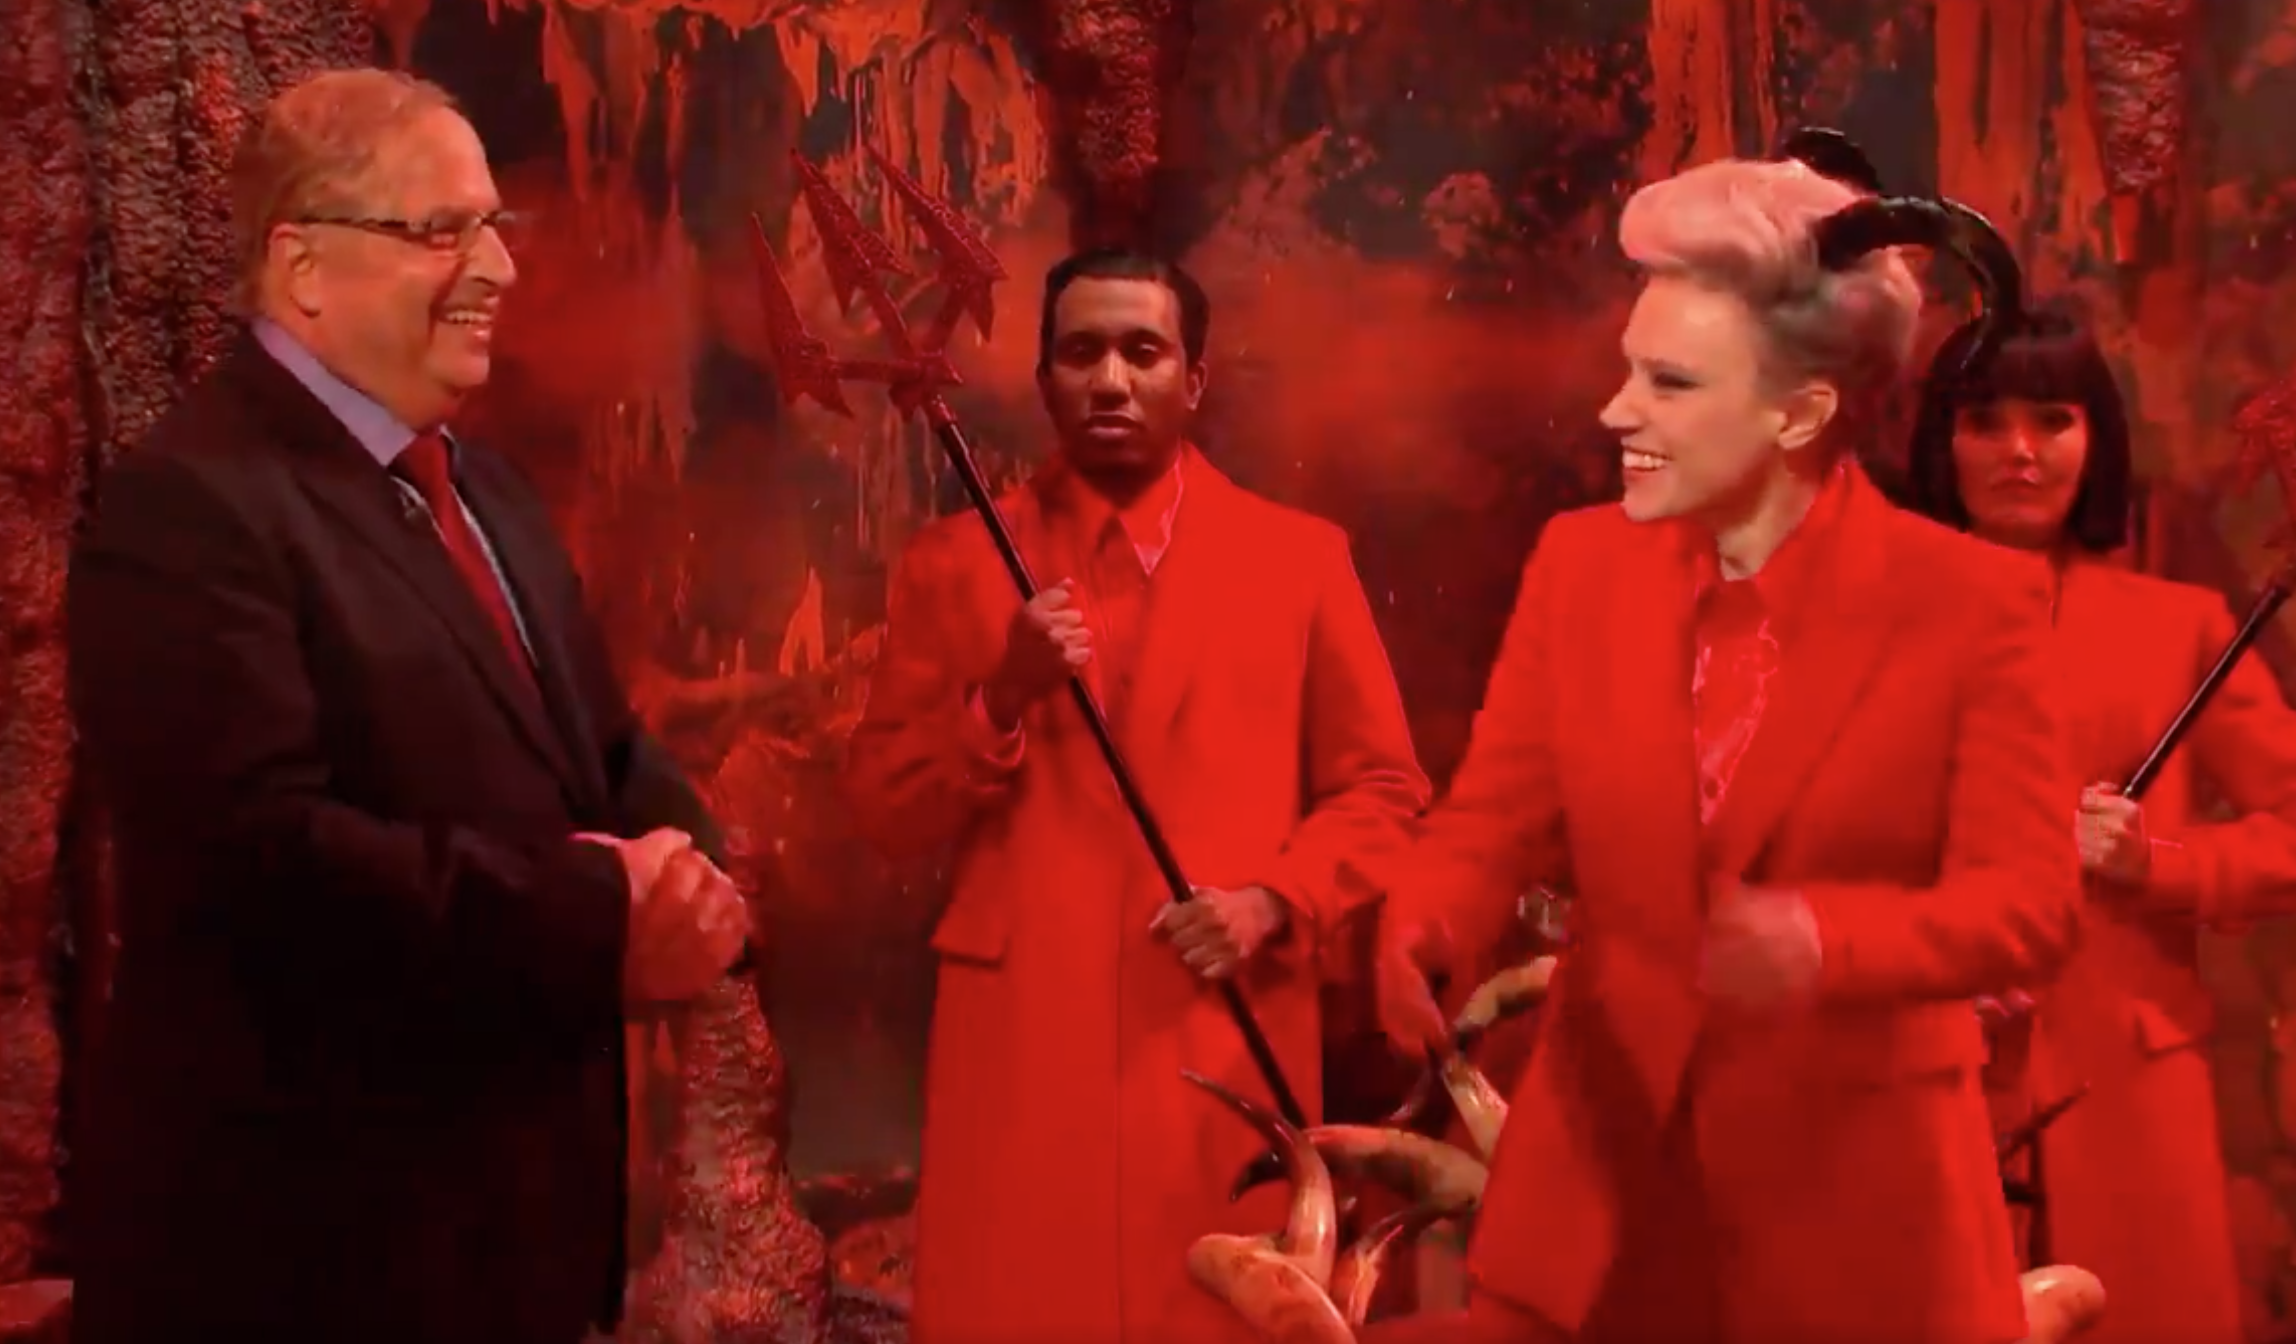 """SNL"": Adam Driver's Epstein meets Jon Lovitz's Dershowitz in hell - Axios"